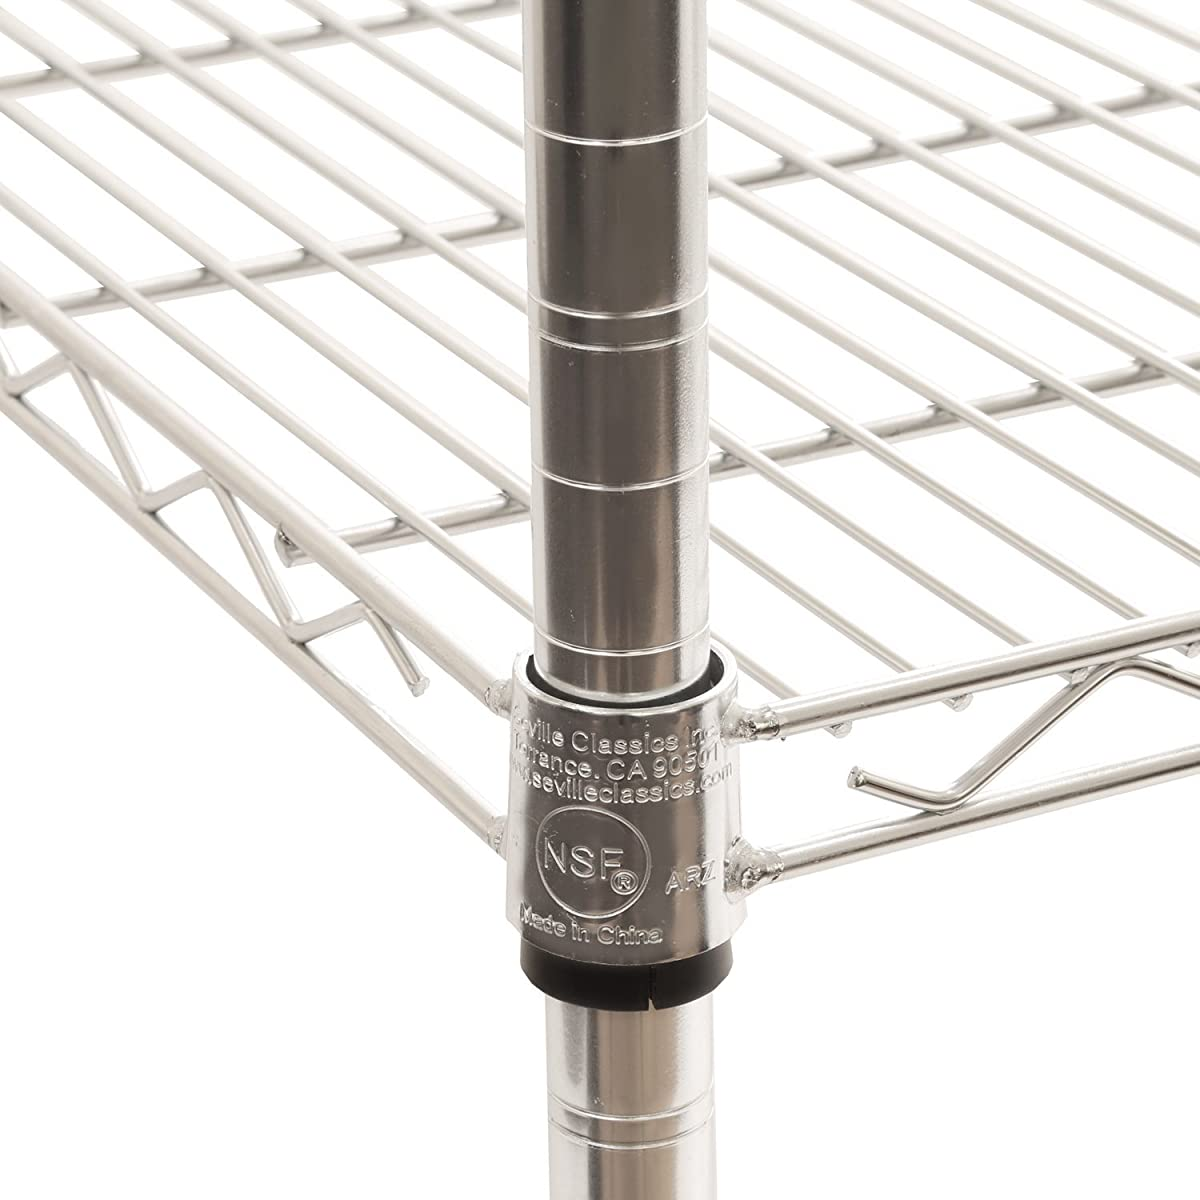 "Seville Classics UltraDurable 5-Tier NSF Steel Wire Shelving with Wheels 18"" D x 24"" W x 72"" H UltraZinc"